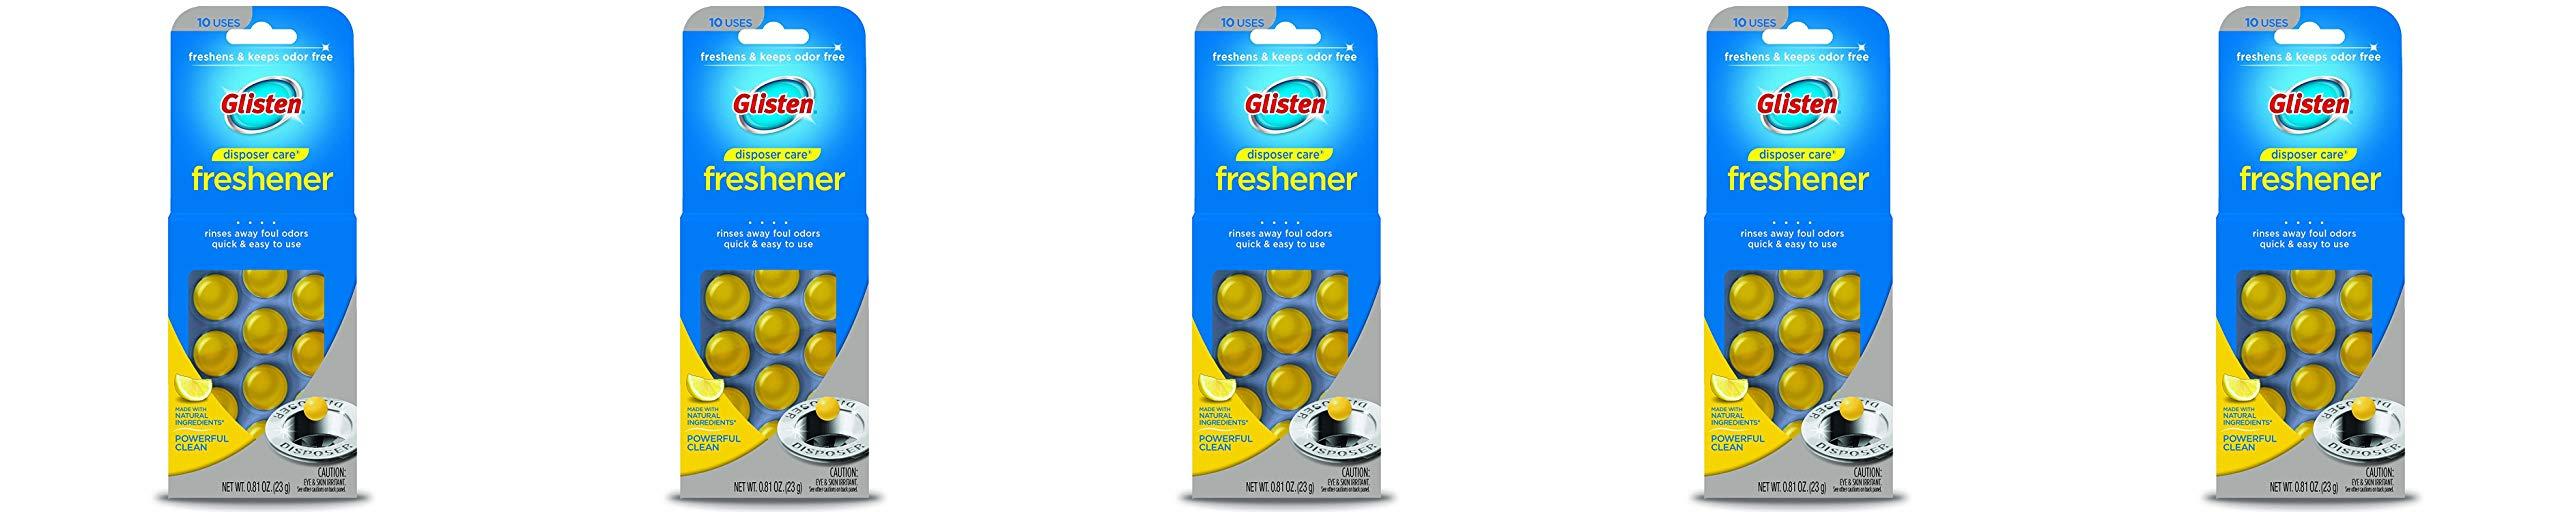 Glisten Disposer Care Freshener, Lemon Scent, 10 Use - 5 Pack by Glisten